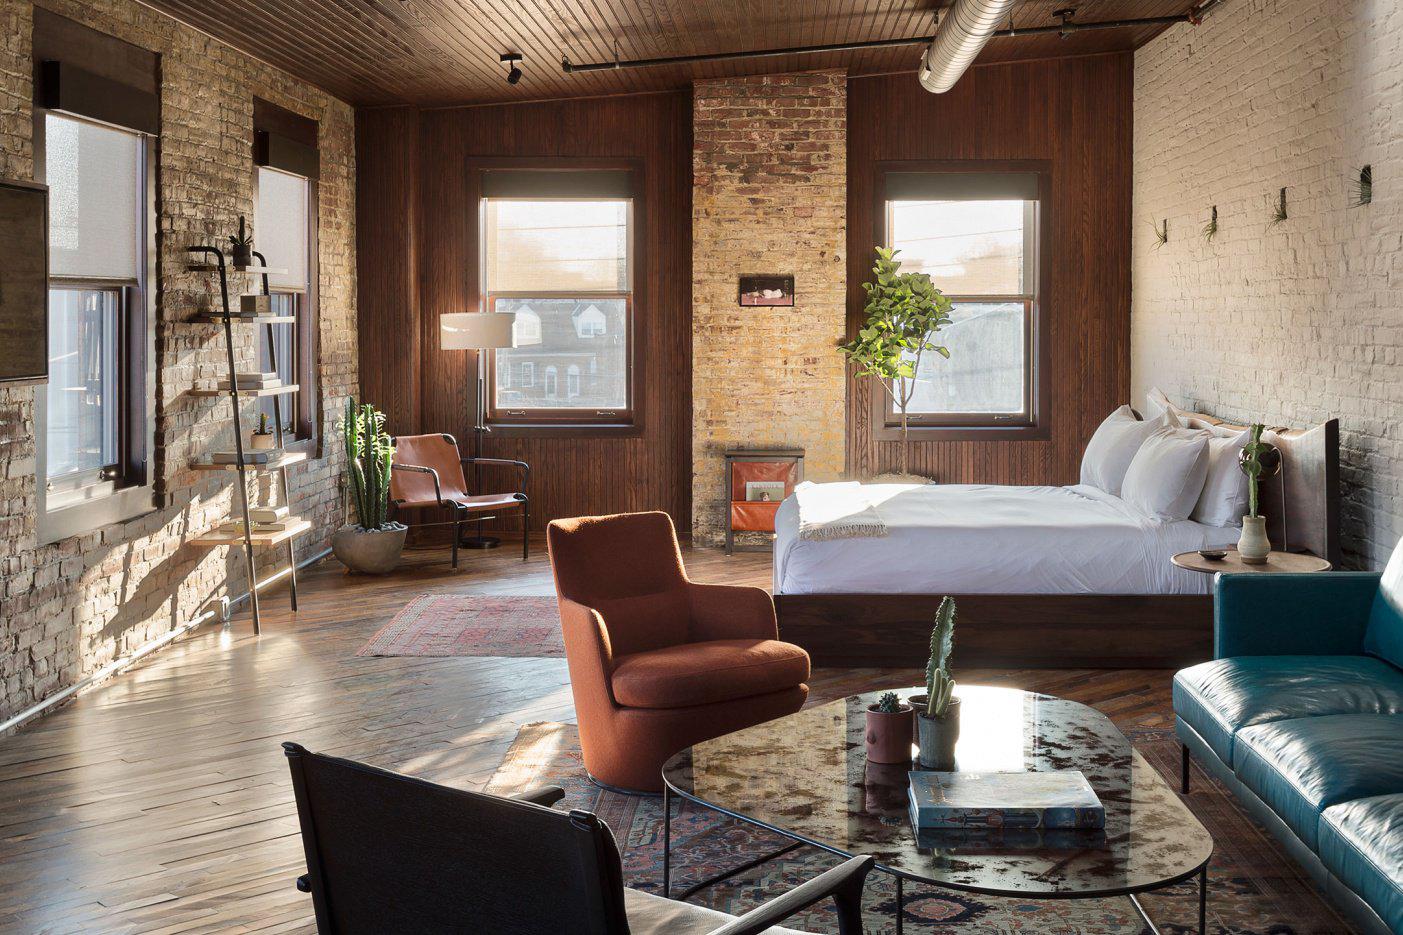 p2_mulherin_s_sons_hotel_restaurant_philadelphia_pa_by_stokes_architecture_photo_matthew_williams_yatzer.jpg